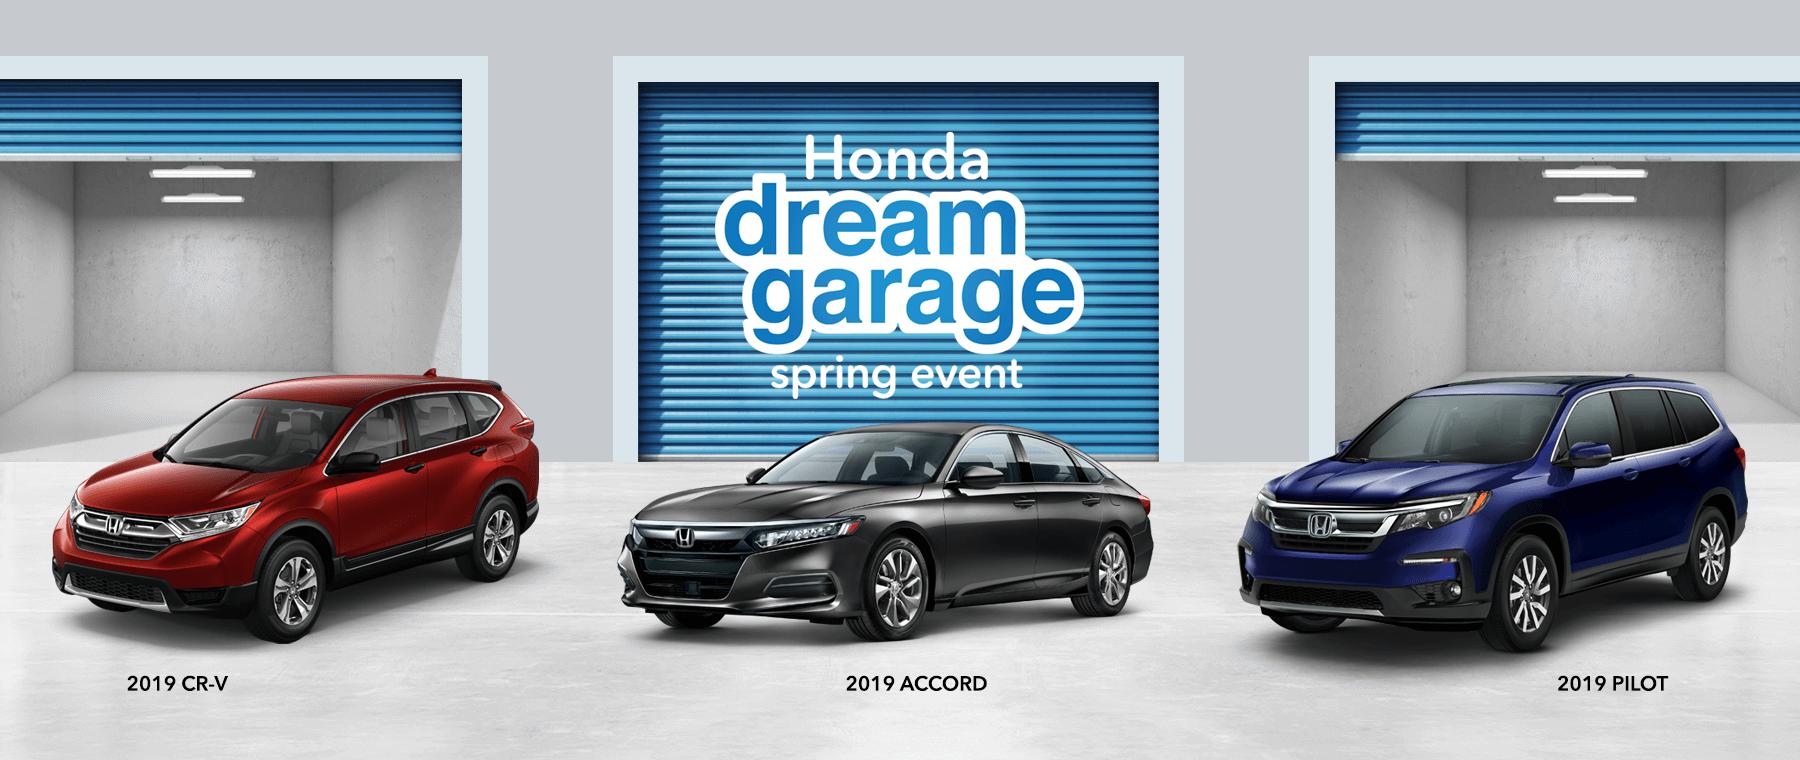 New England Honda Dealers 2019 Honda Dream Garage HP Slide